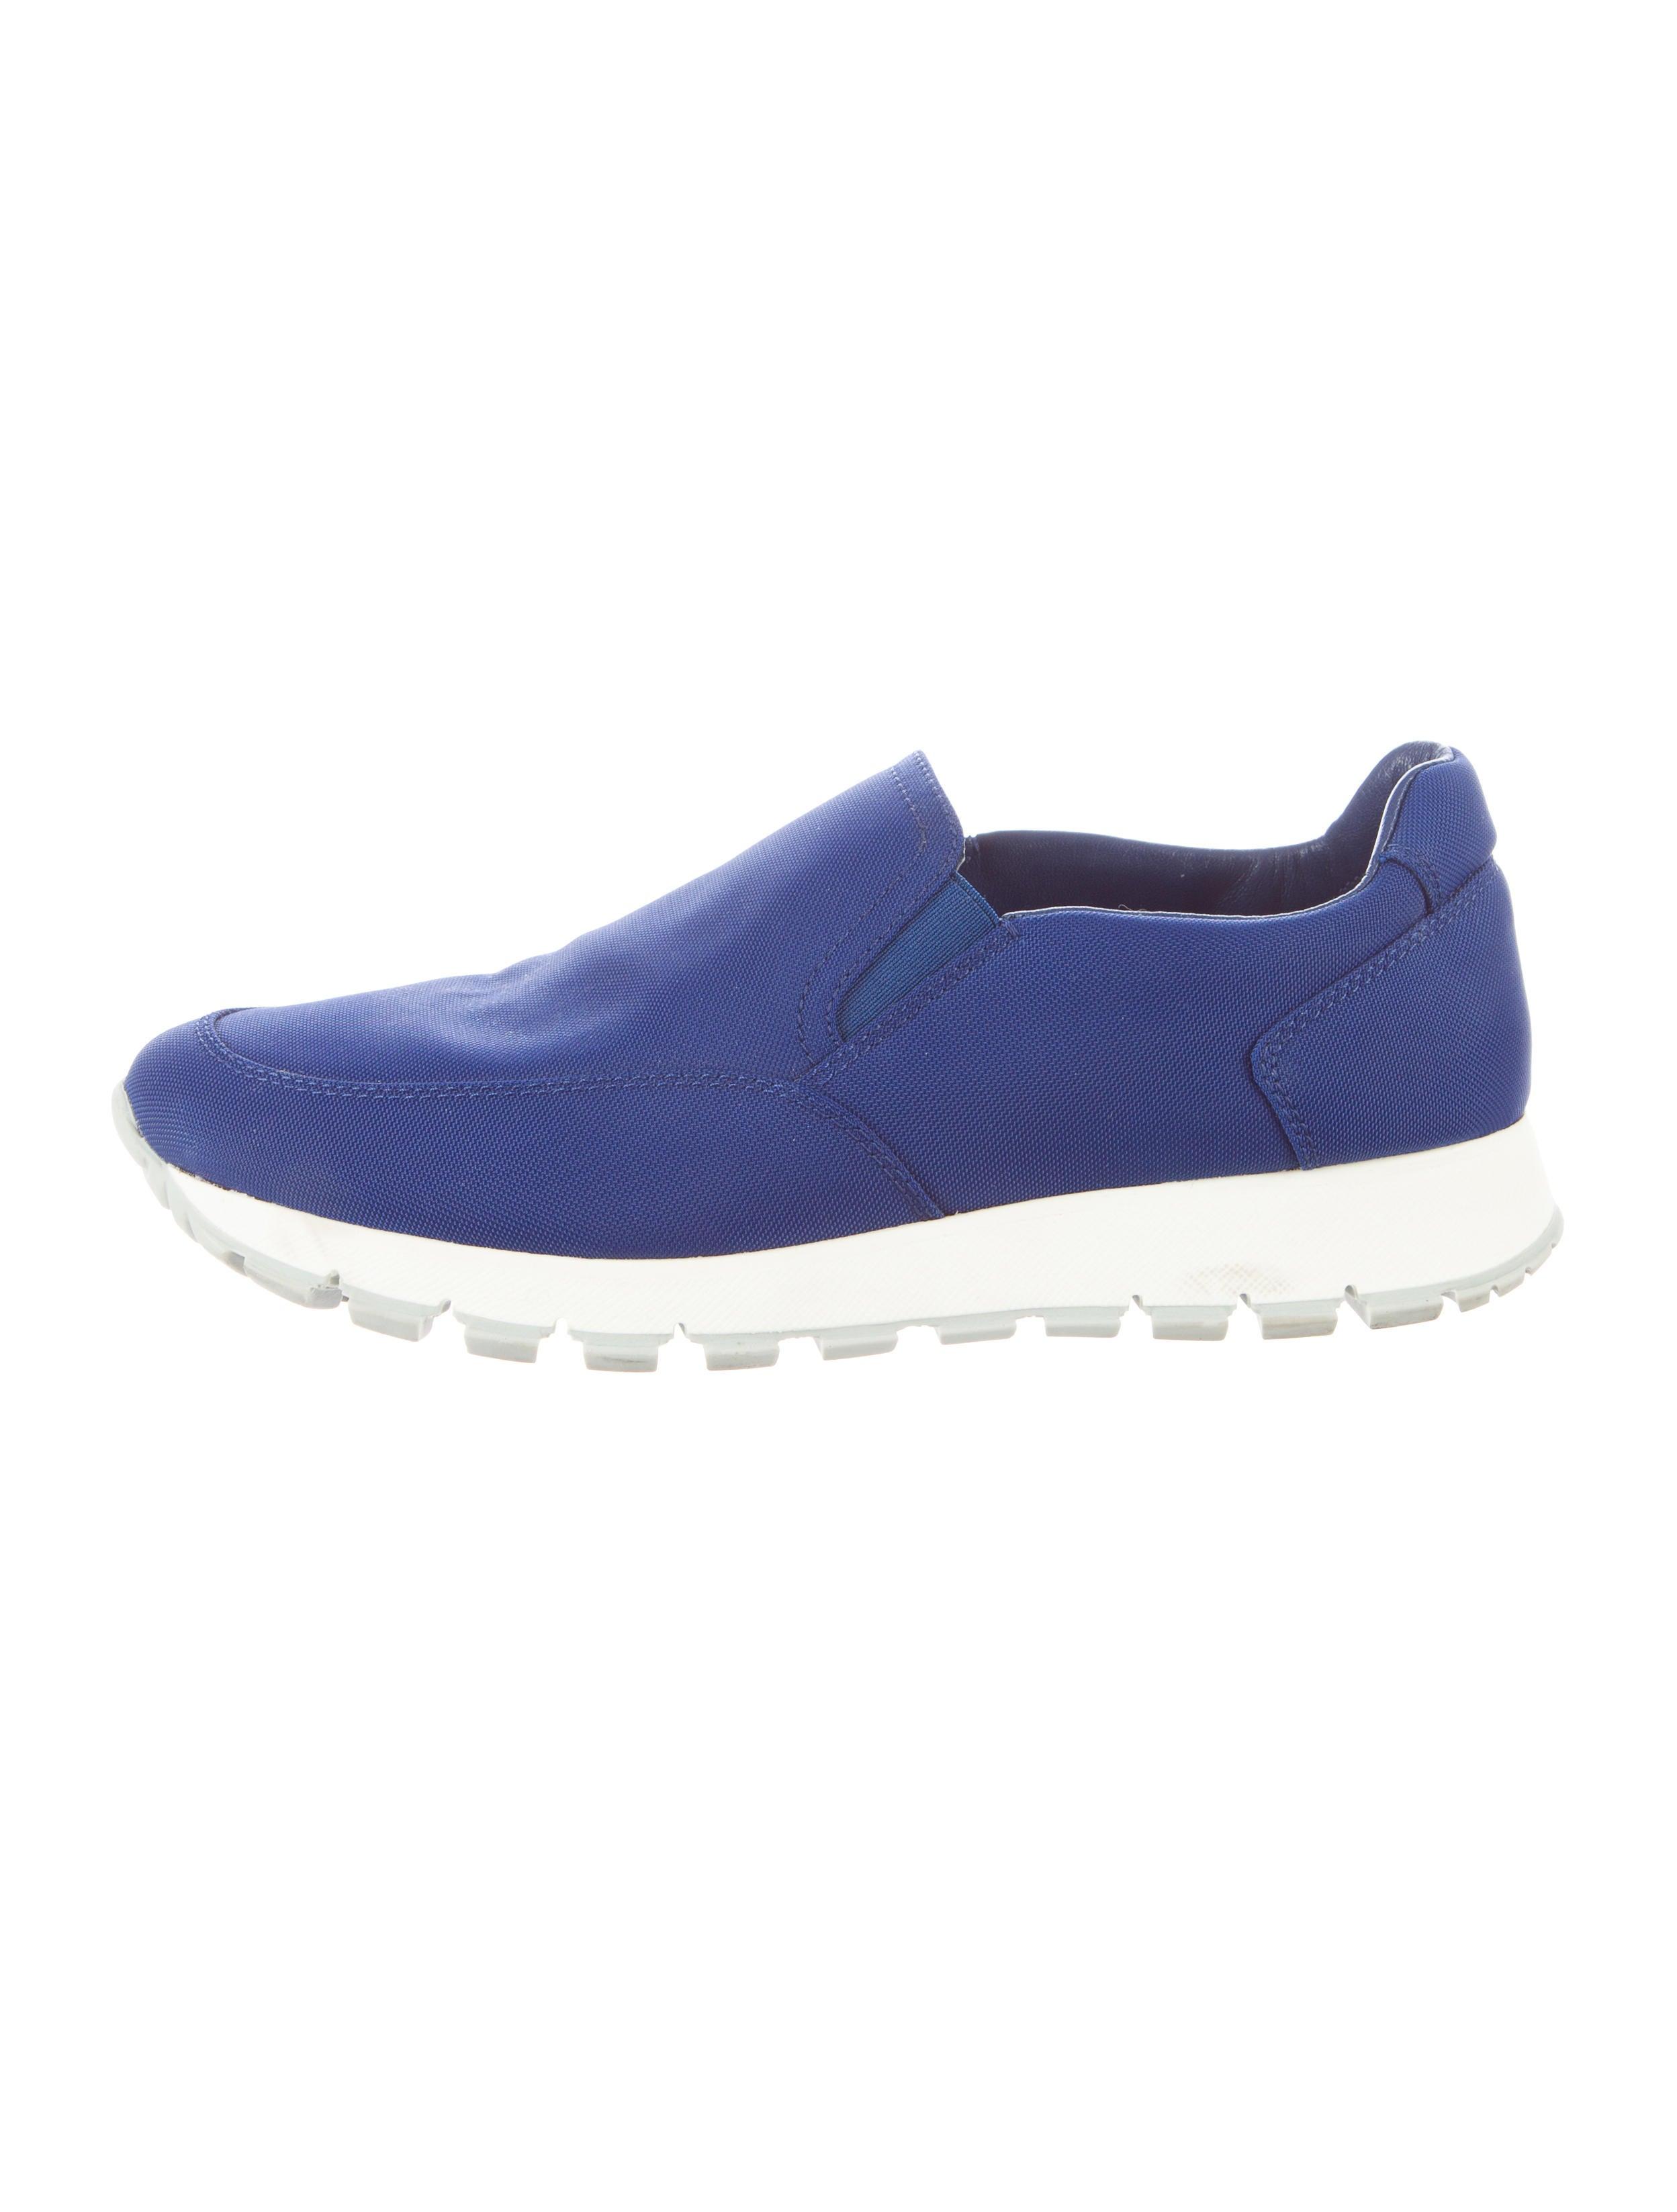 prada sport slip on sneakers shoes wpr29303 the realreal